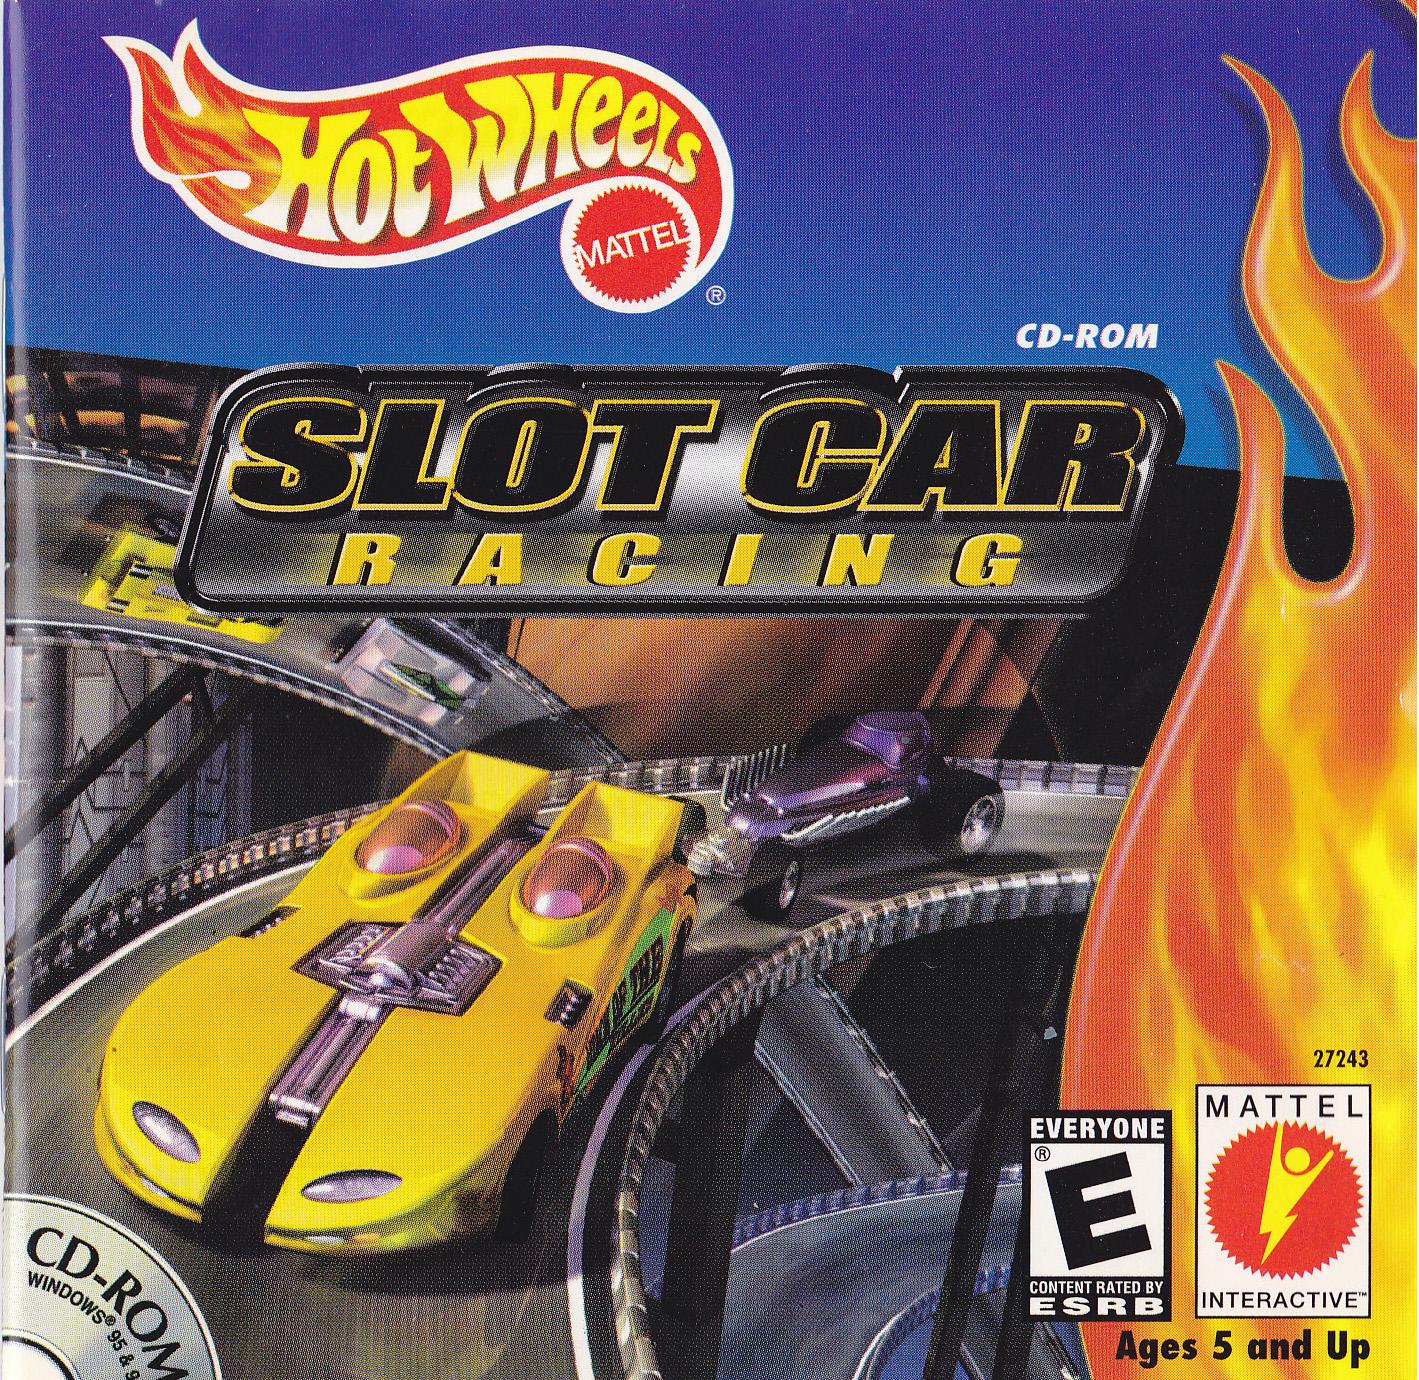 Hot Wheels Slot Car Racing | Hot Wheels Wiki | FANDOM